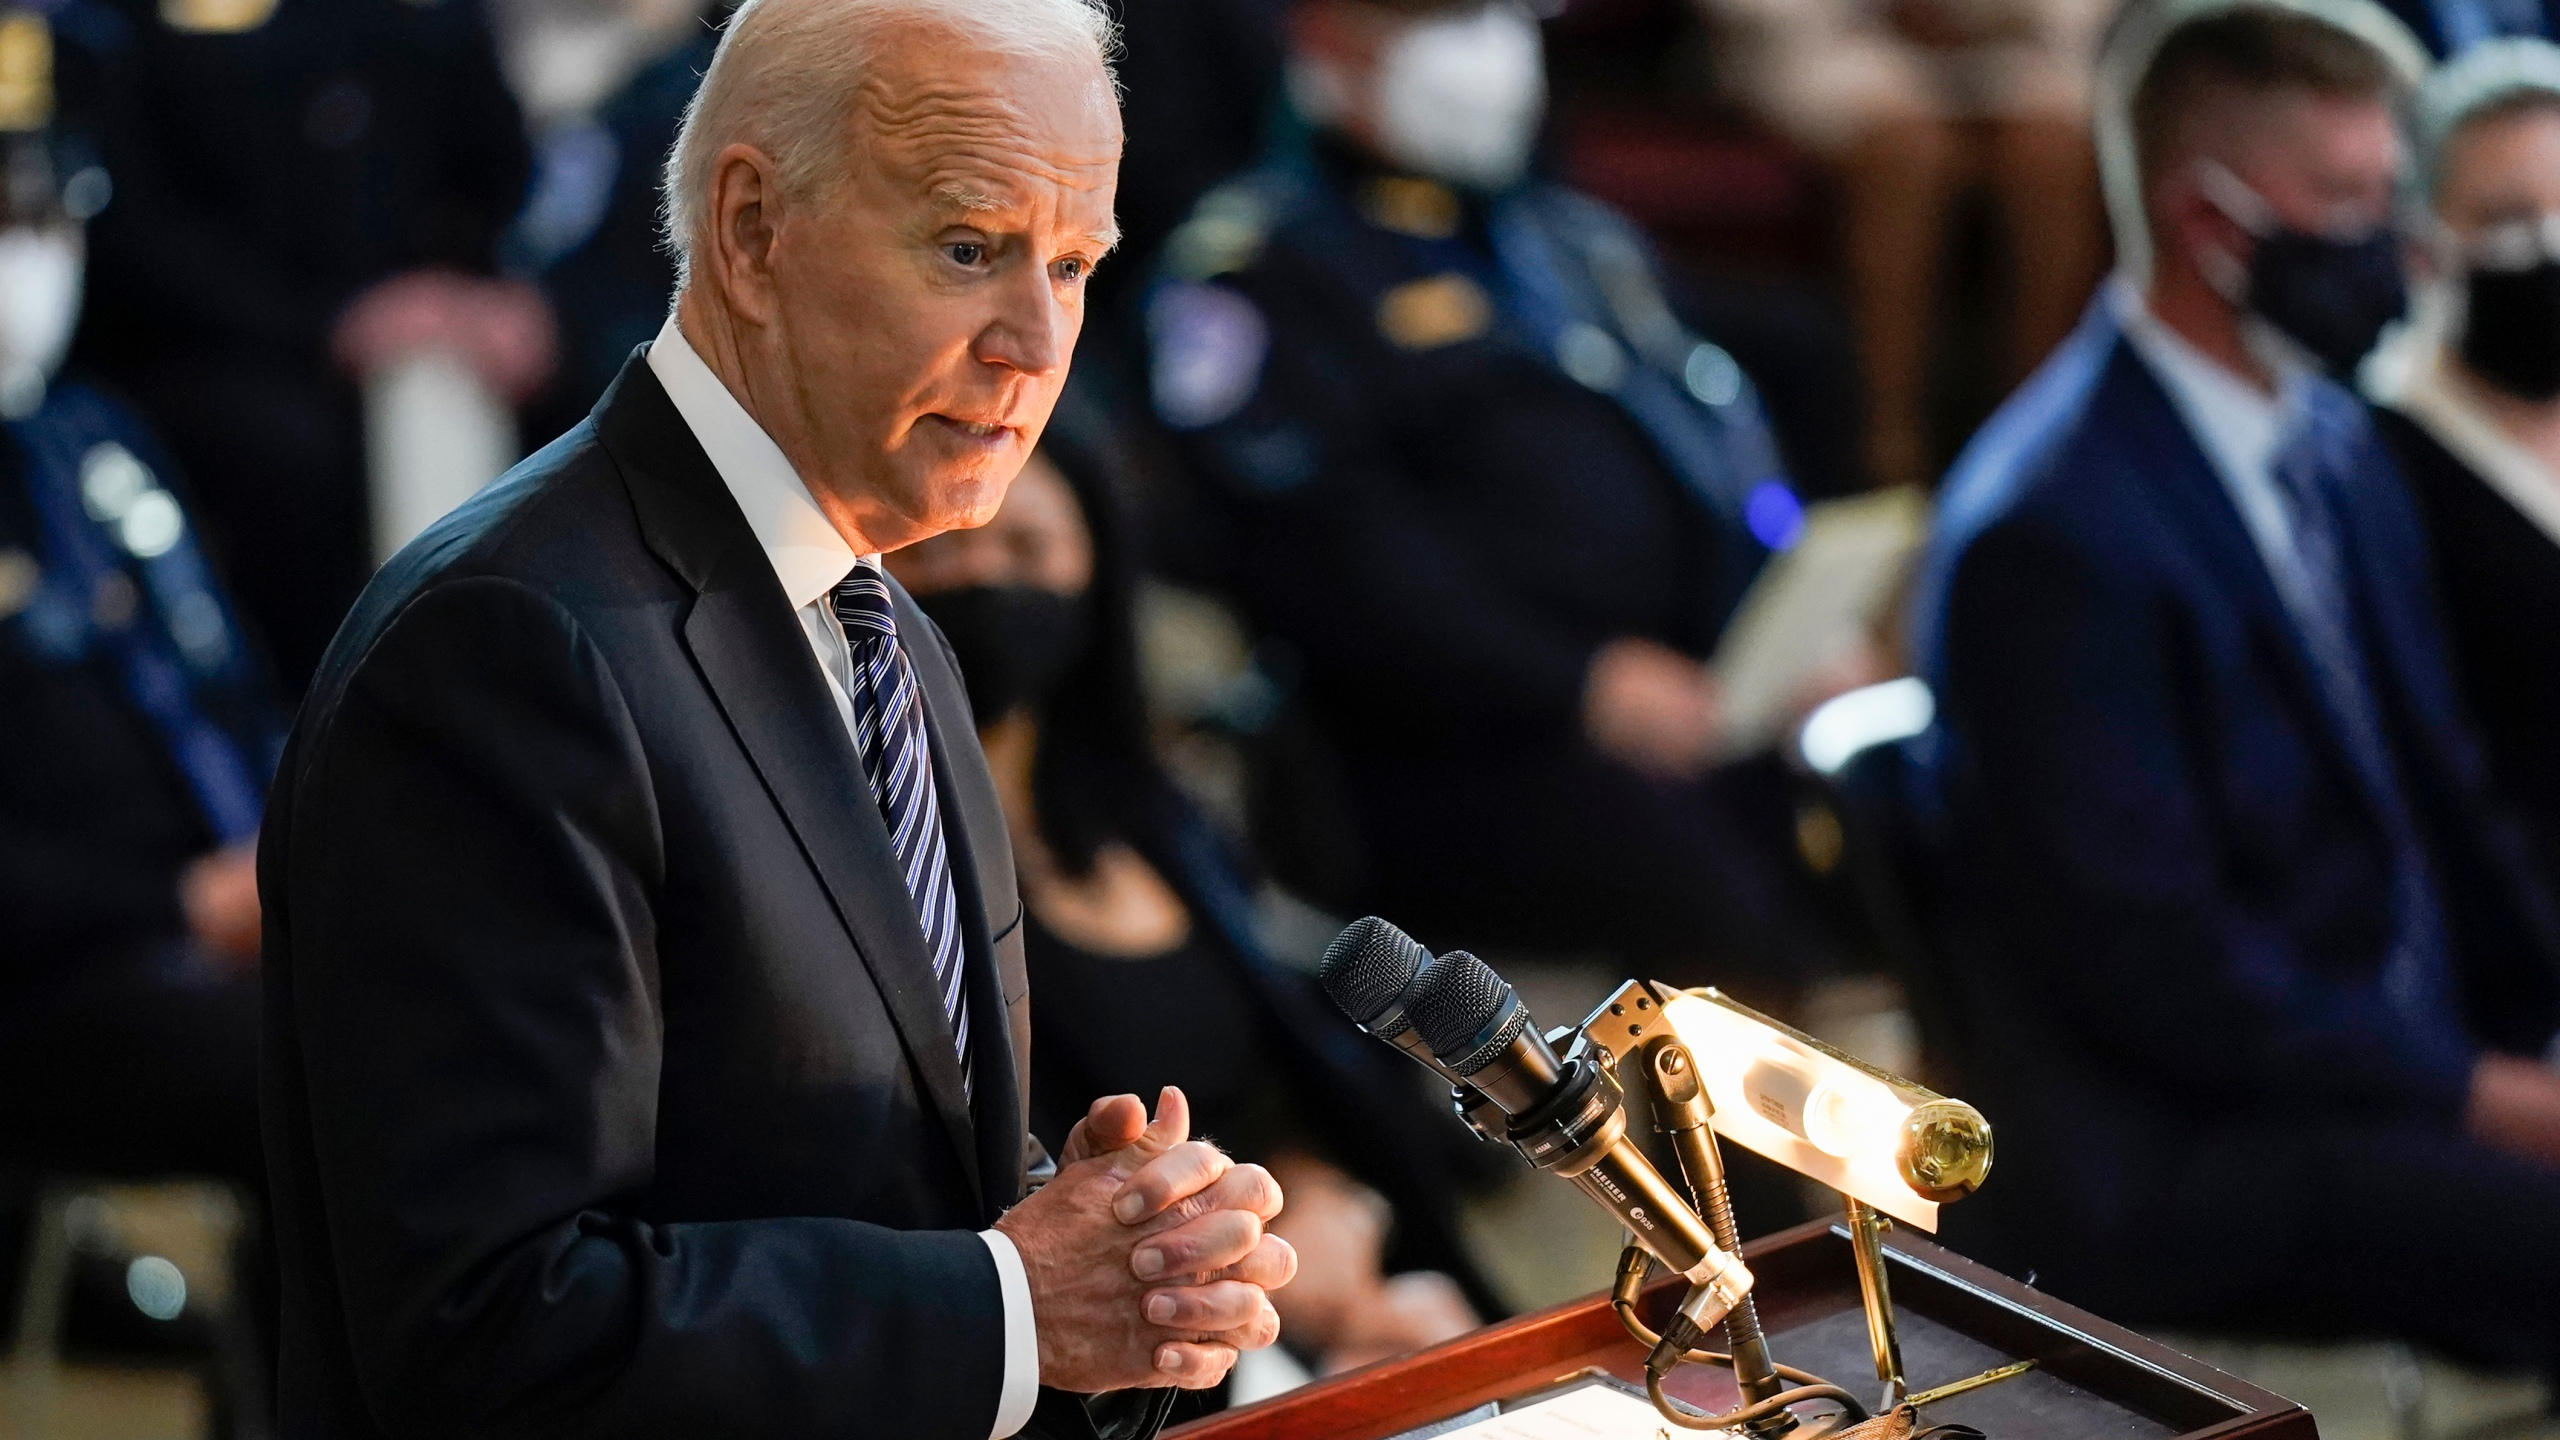 Biden on Afghanistan: 'Time to end America's longest war'   8News